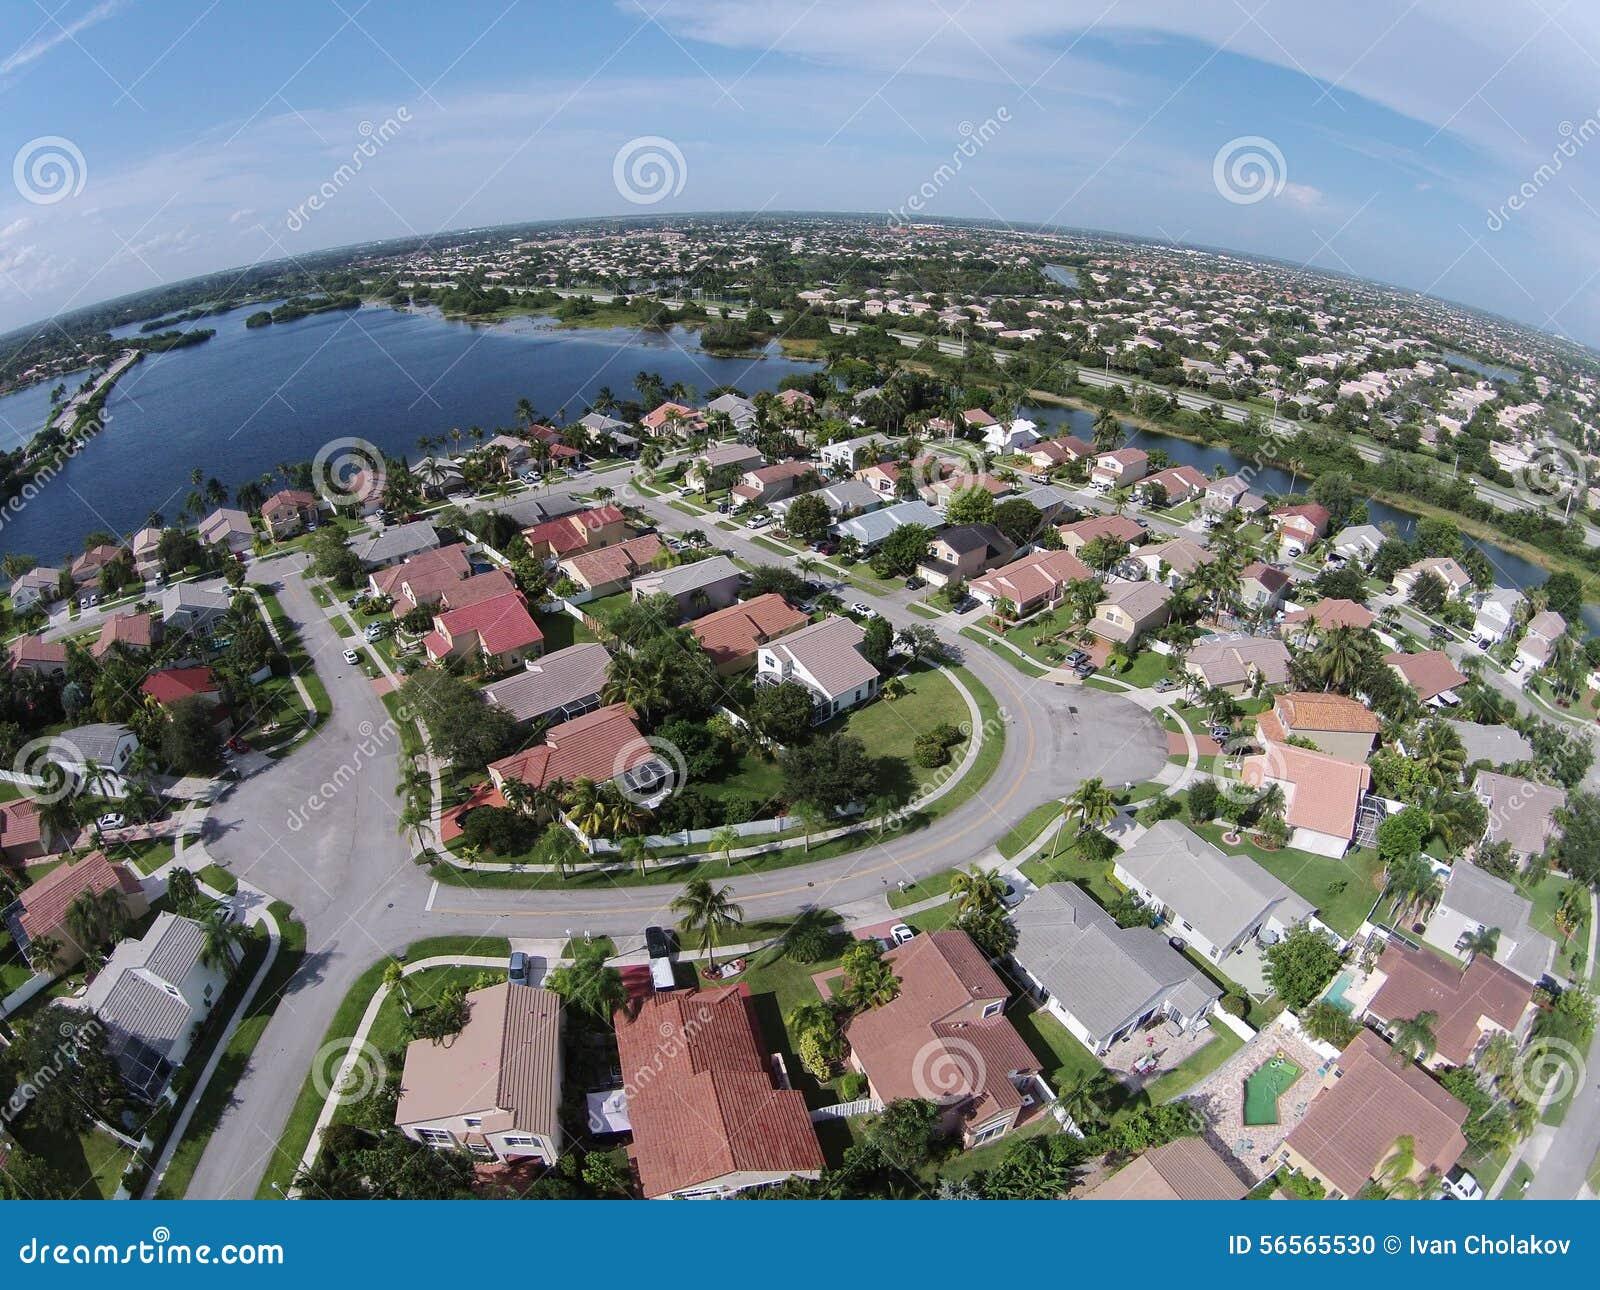 Download Προαστιακά σπίτια στην κεραία της Φλώριδας Στοκ Εικόνες - εικόνα από cityscape, προαστιακός: 56565530